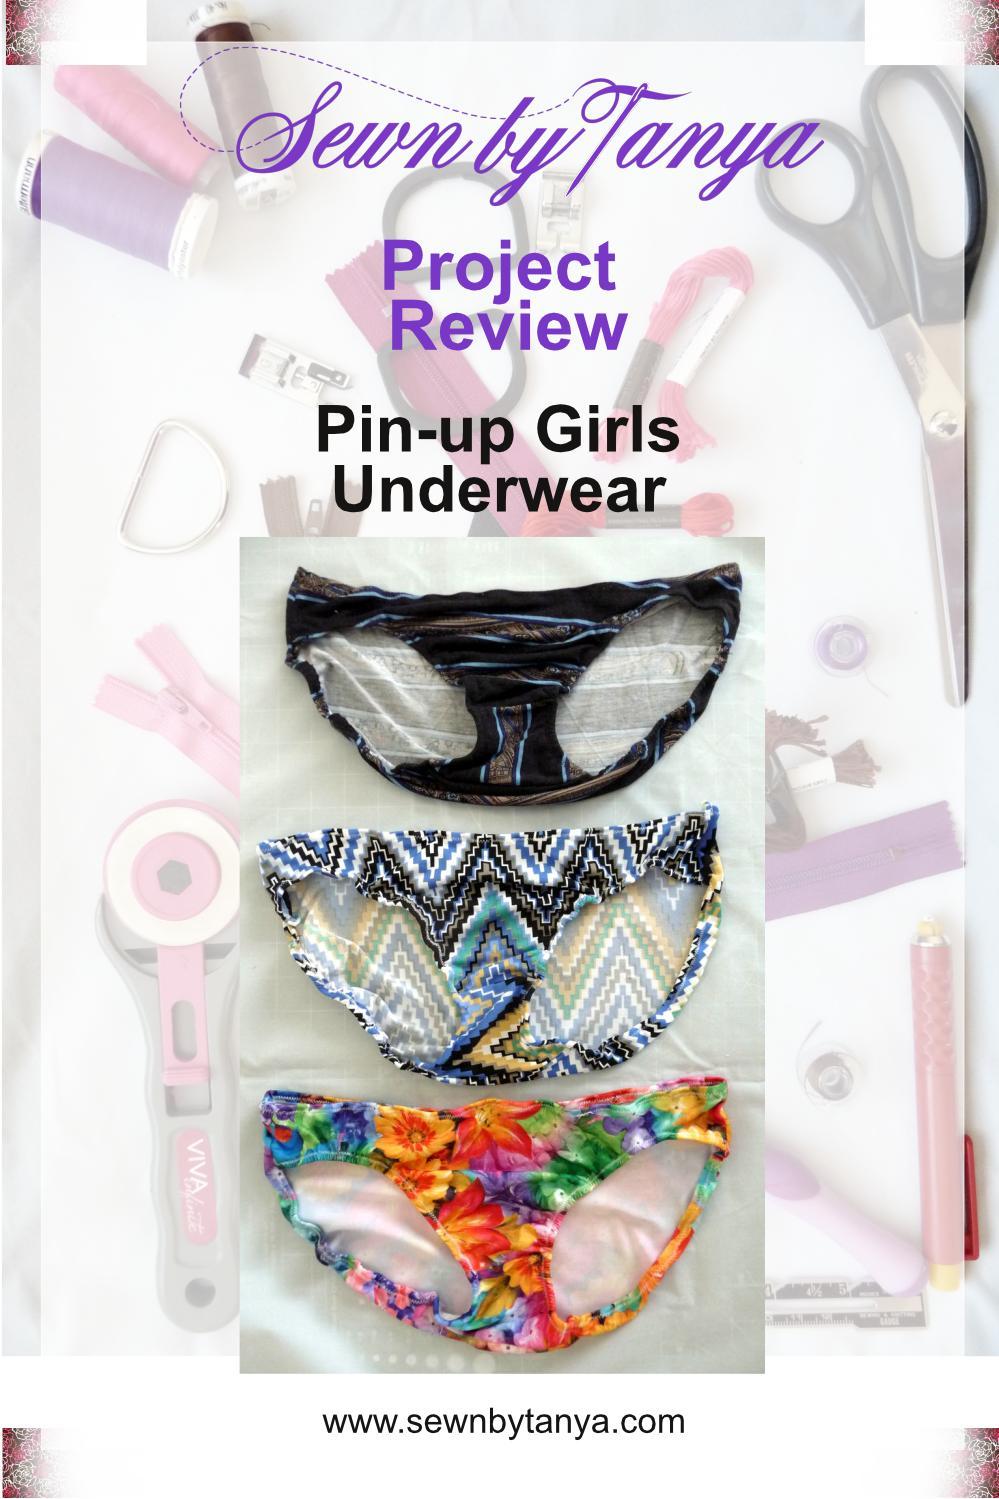 Black stripped panties, multic-lored zigzag panties & floral panties on a white background